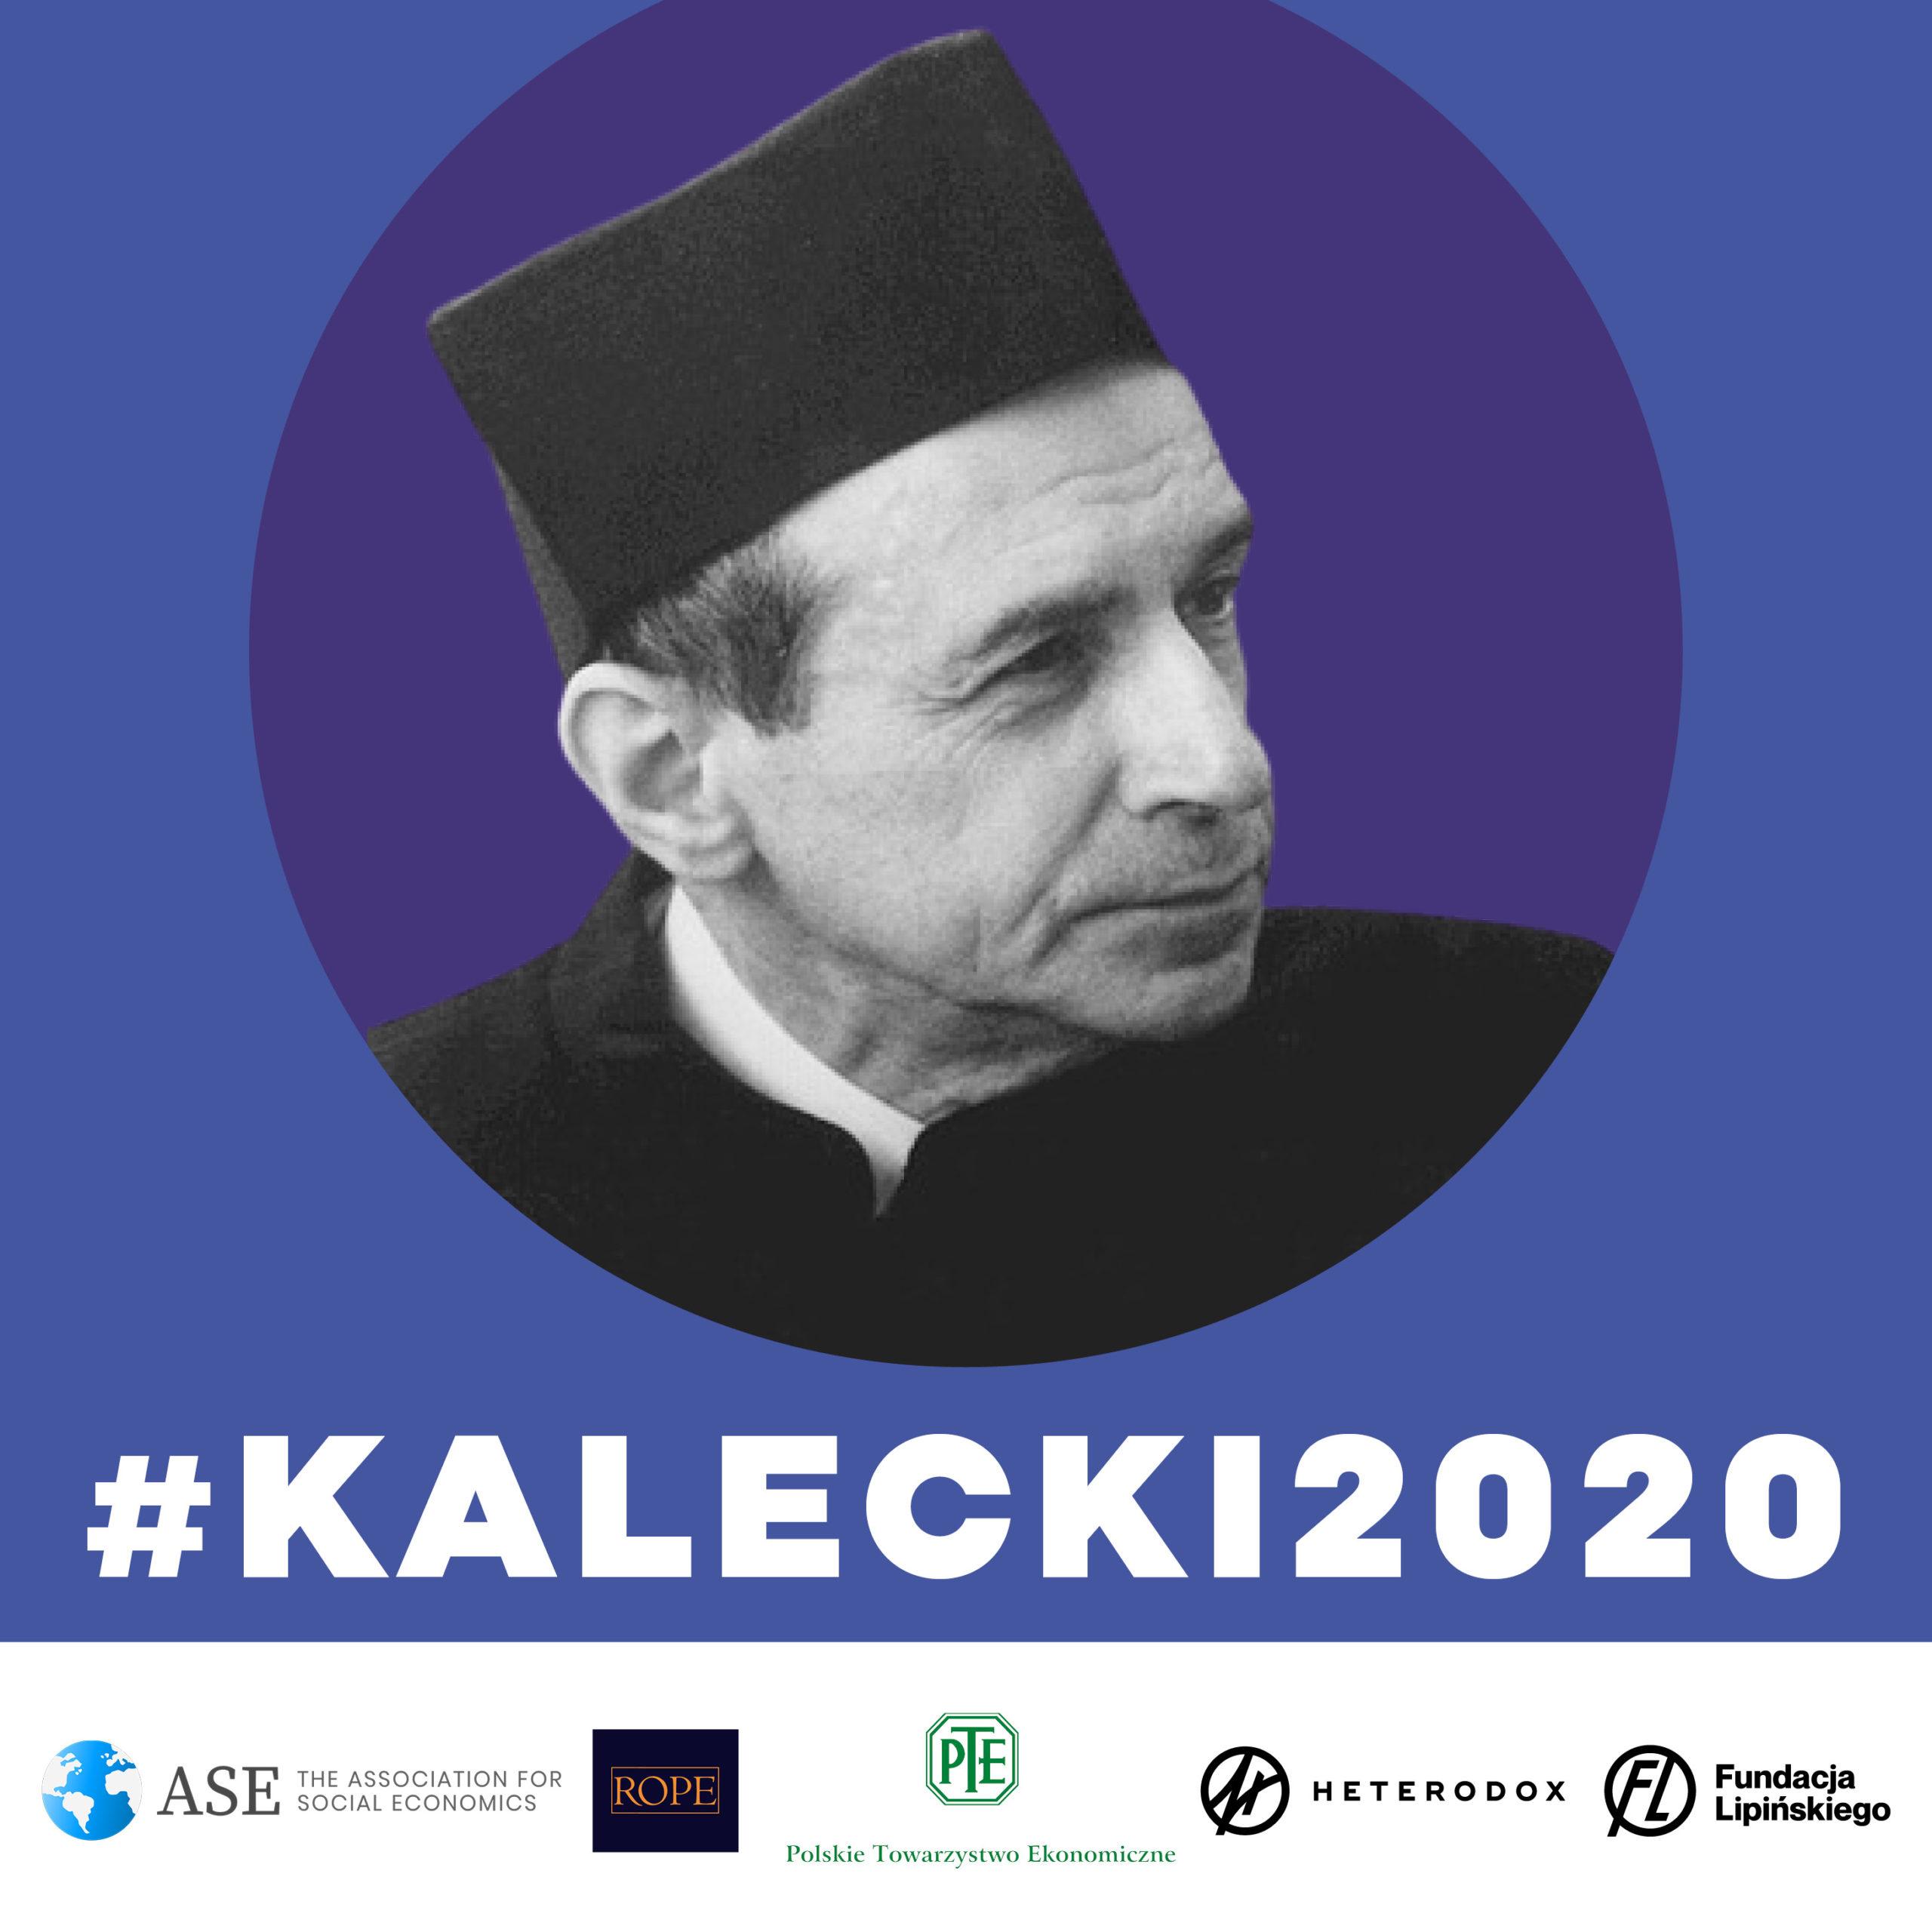 Poster of Kalecki 2020 Conference